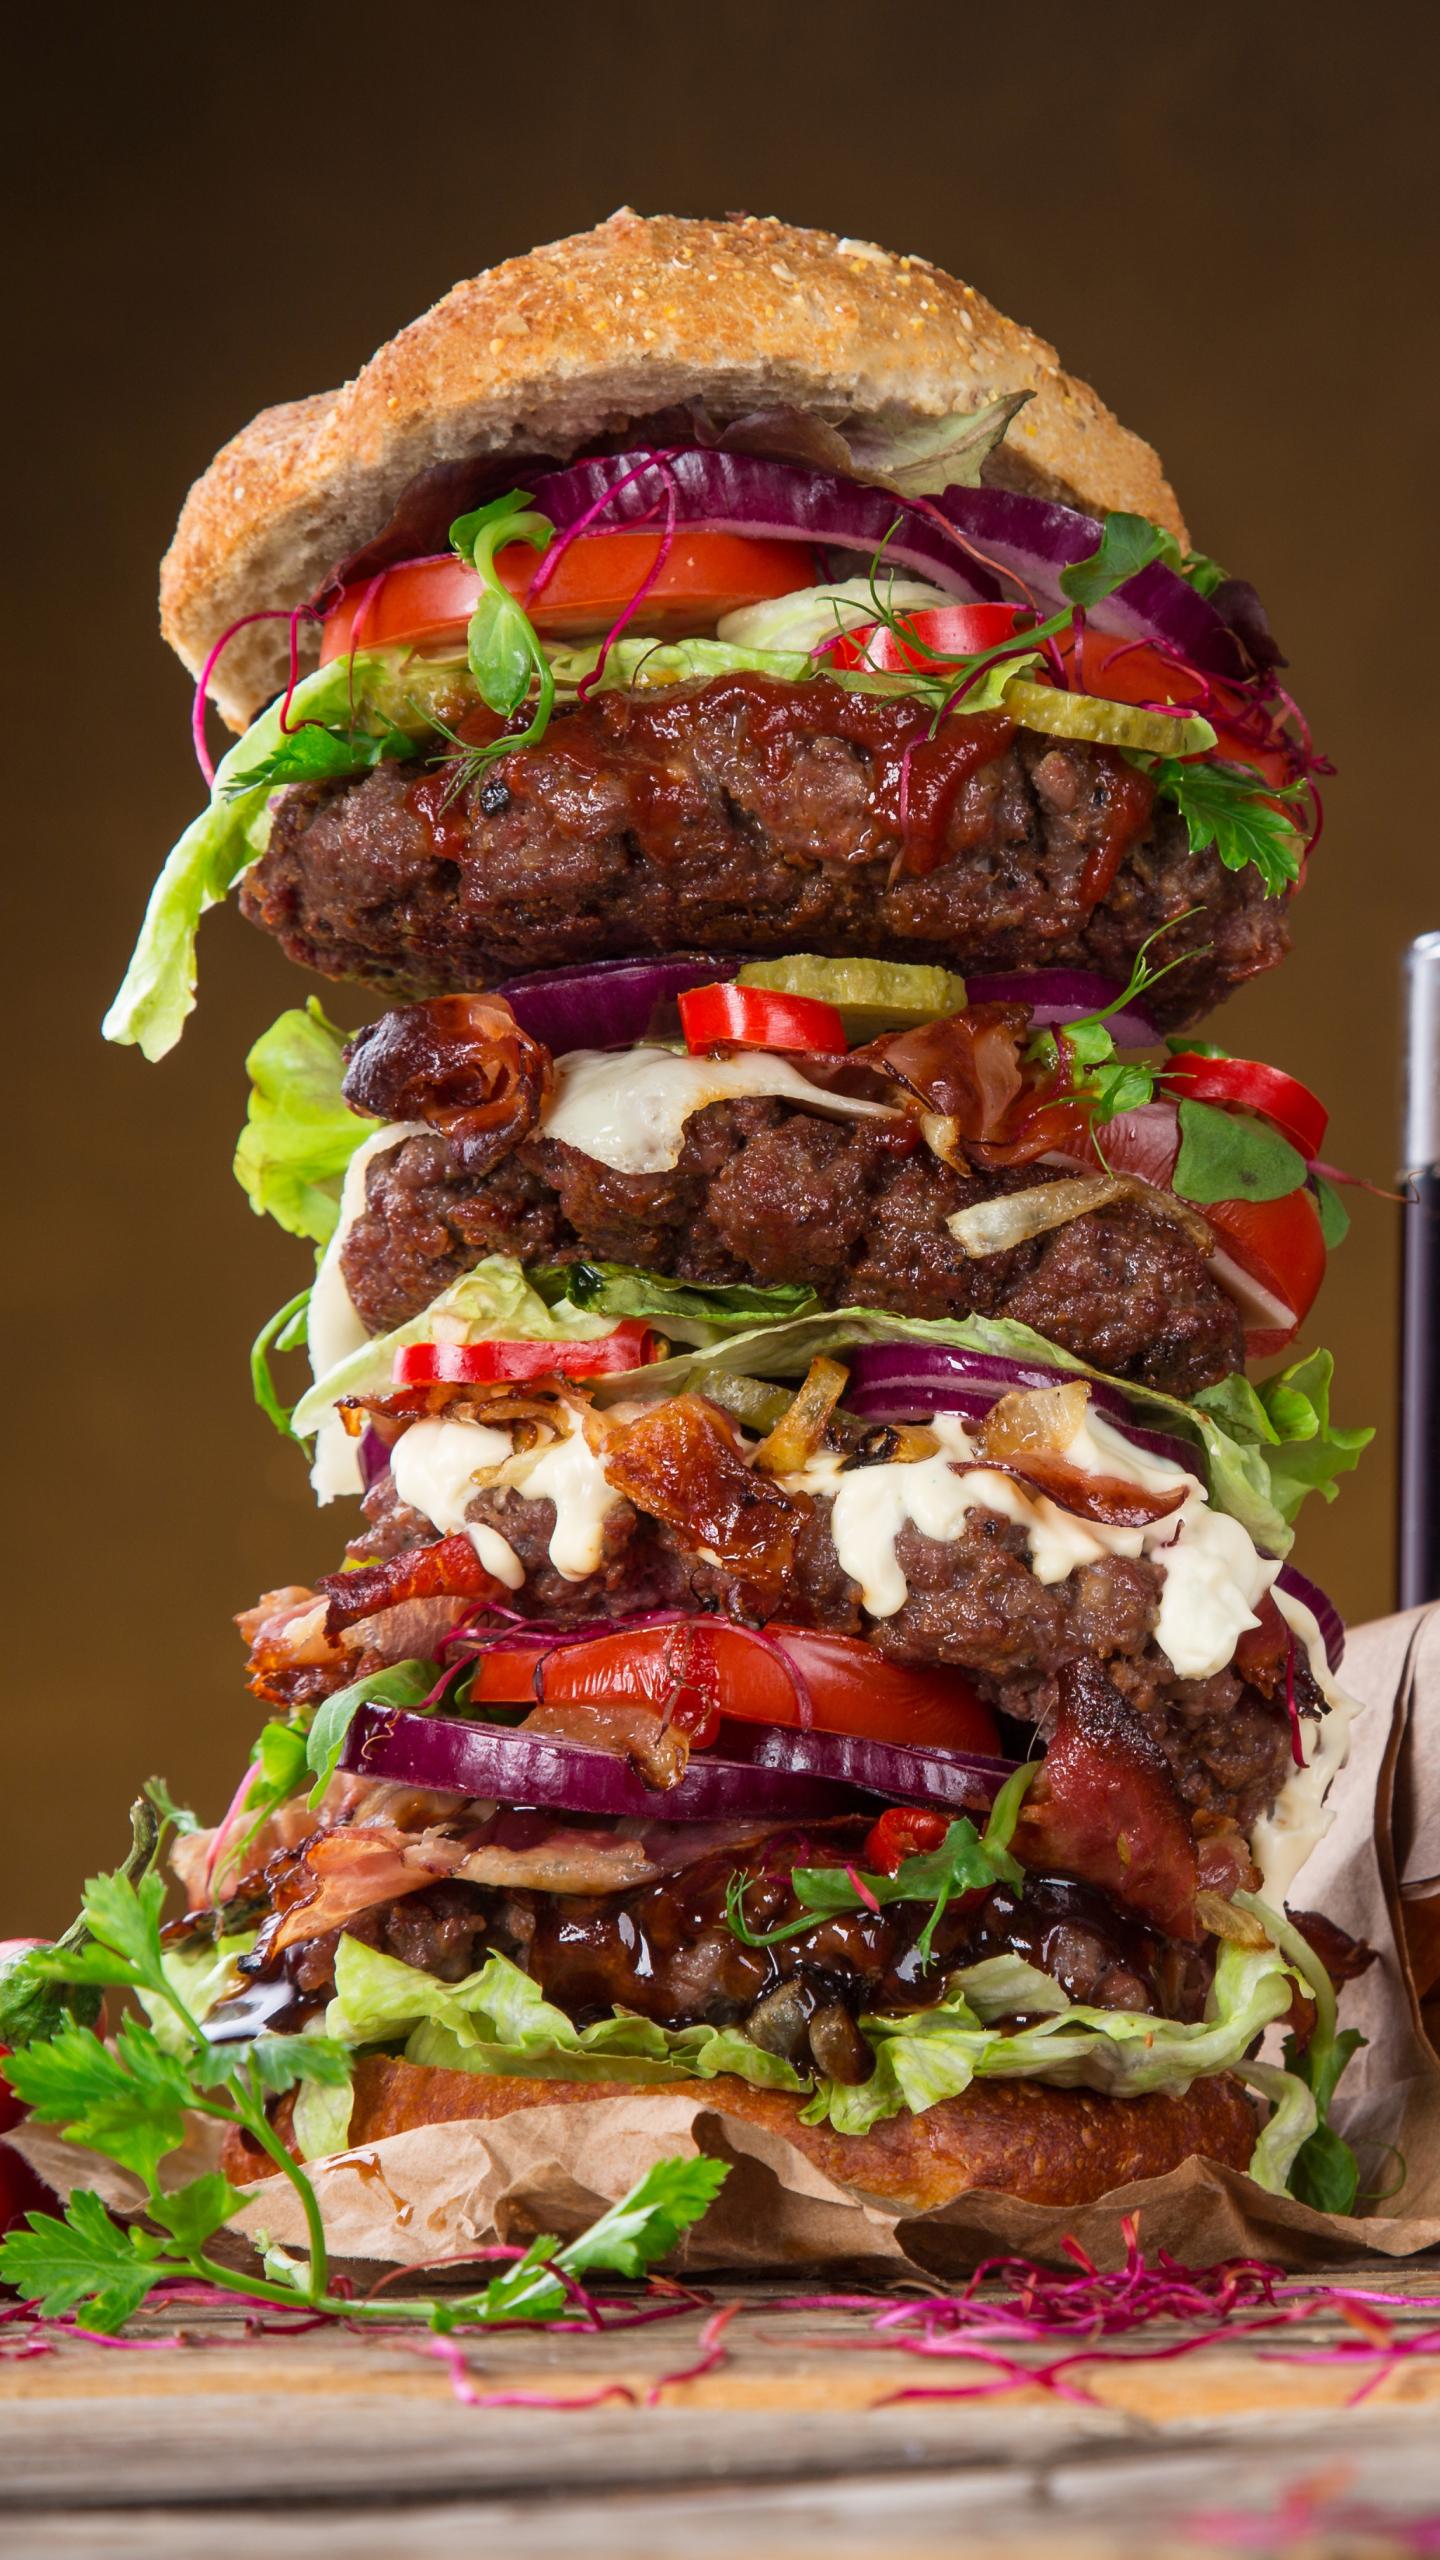 Download Wallpaper 640x1136 Cheeseburger, Burger, Cheese, Bun ...